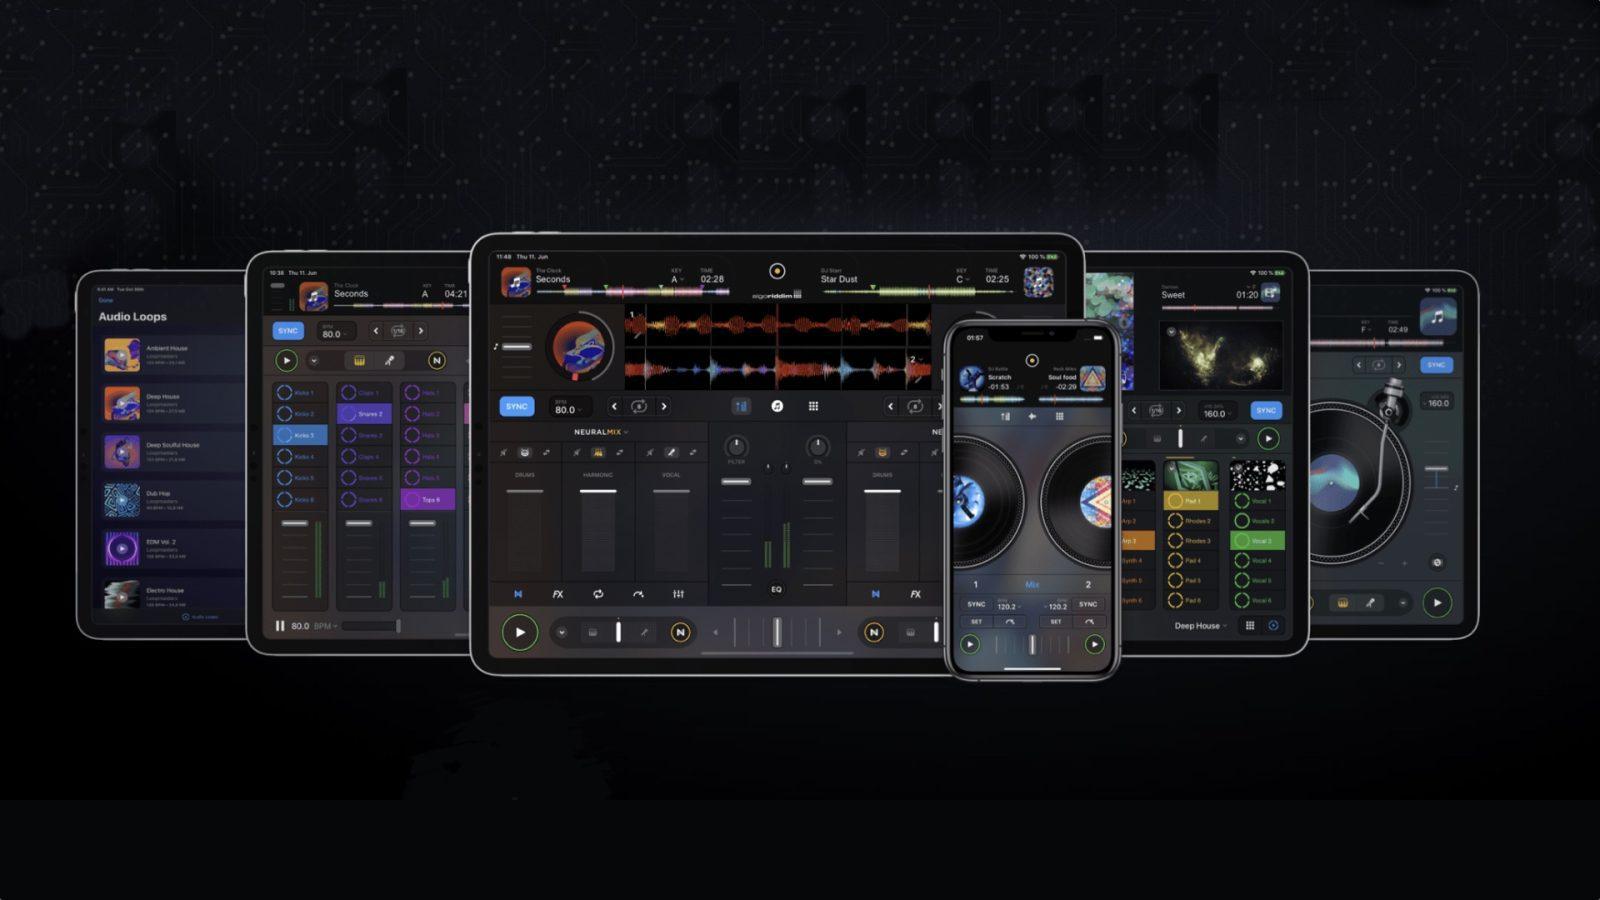 Algoriddim integrates ShazamKit technology with djay